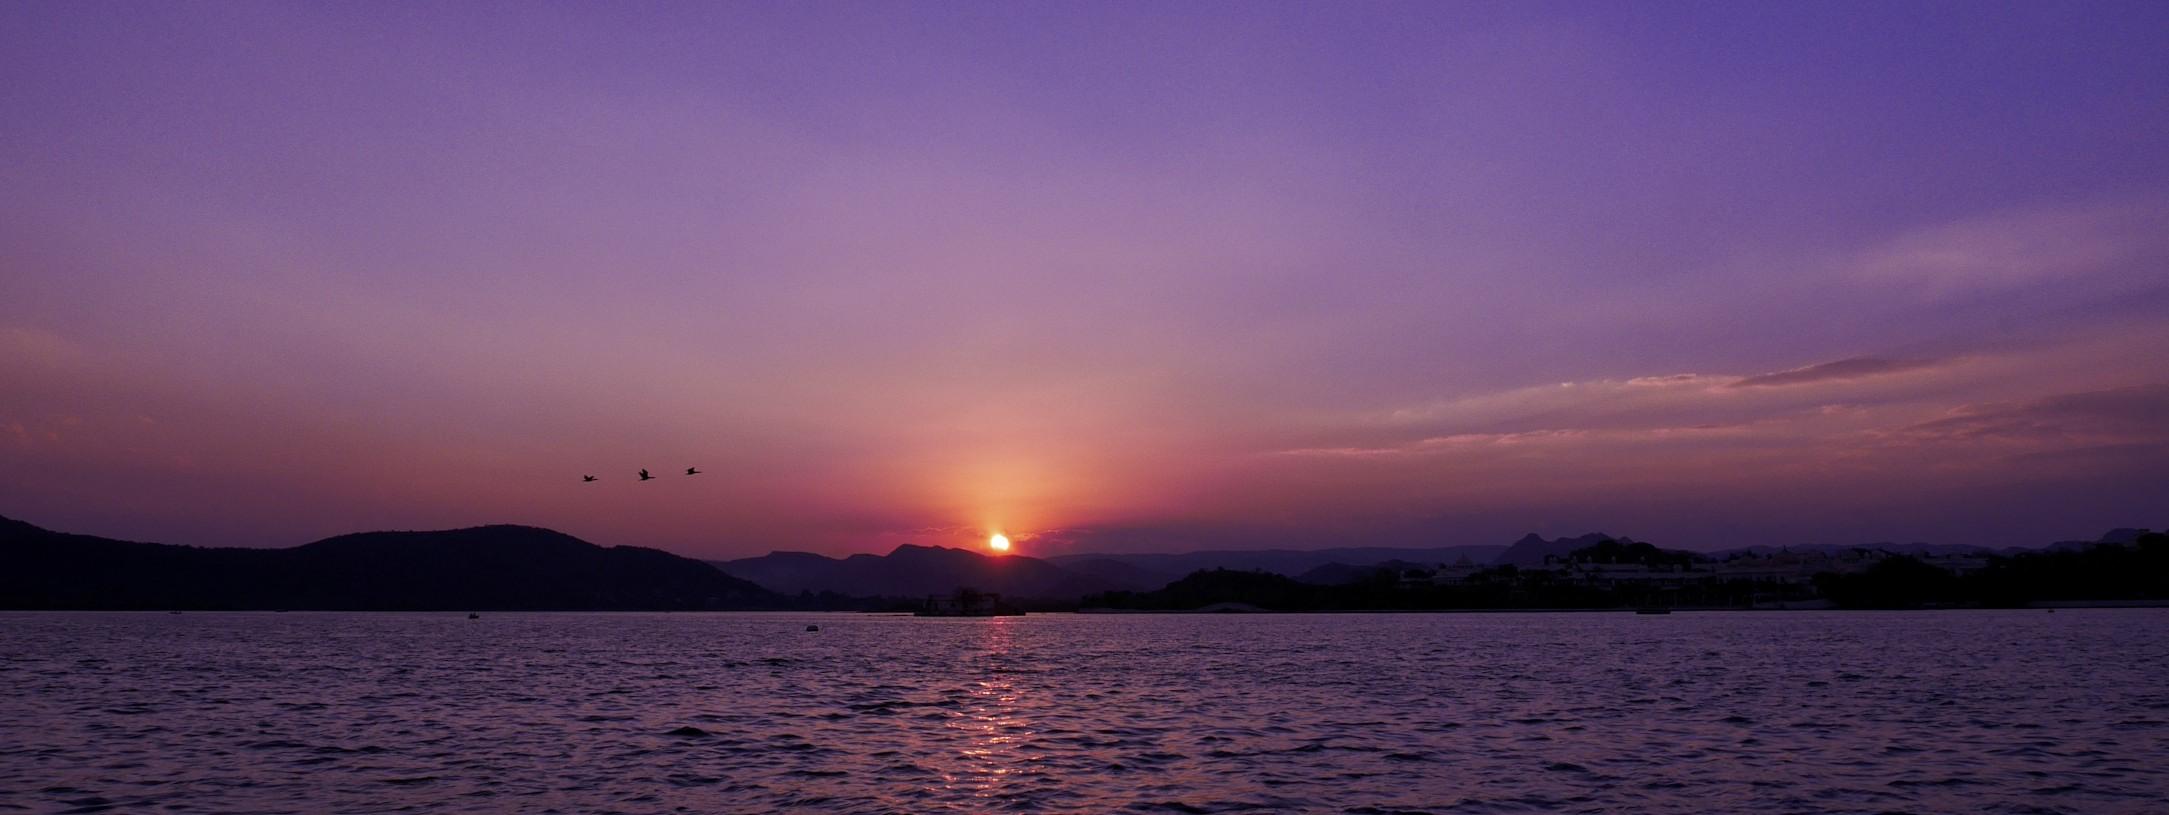 Lake Palace20.jpg